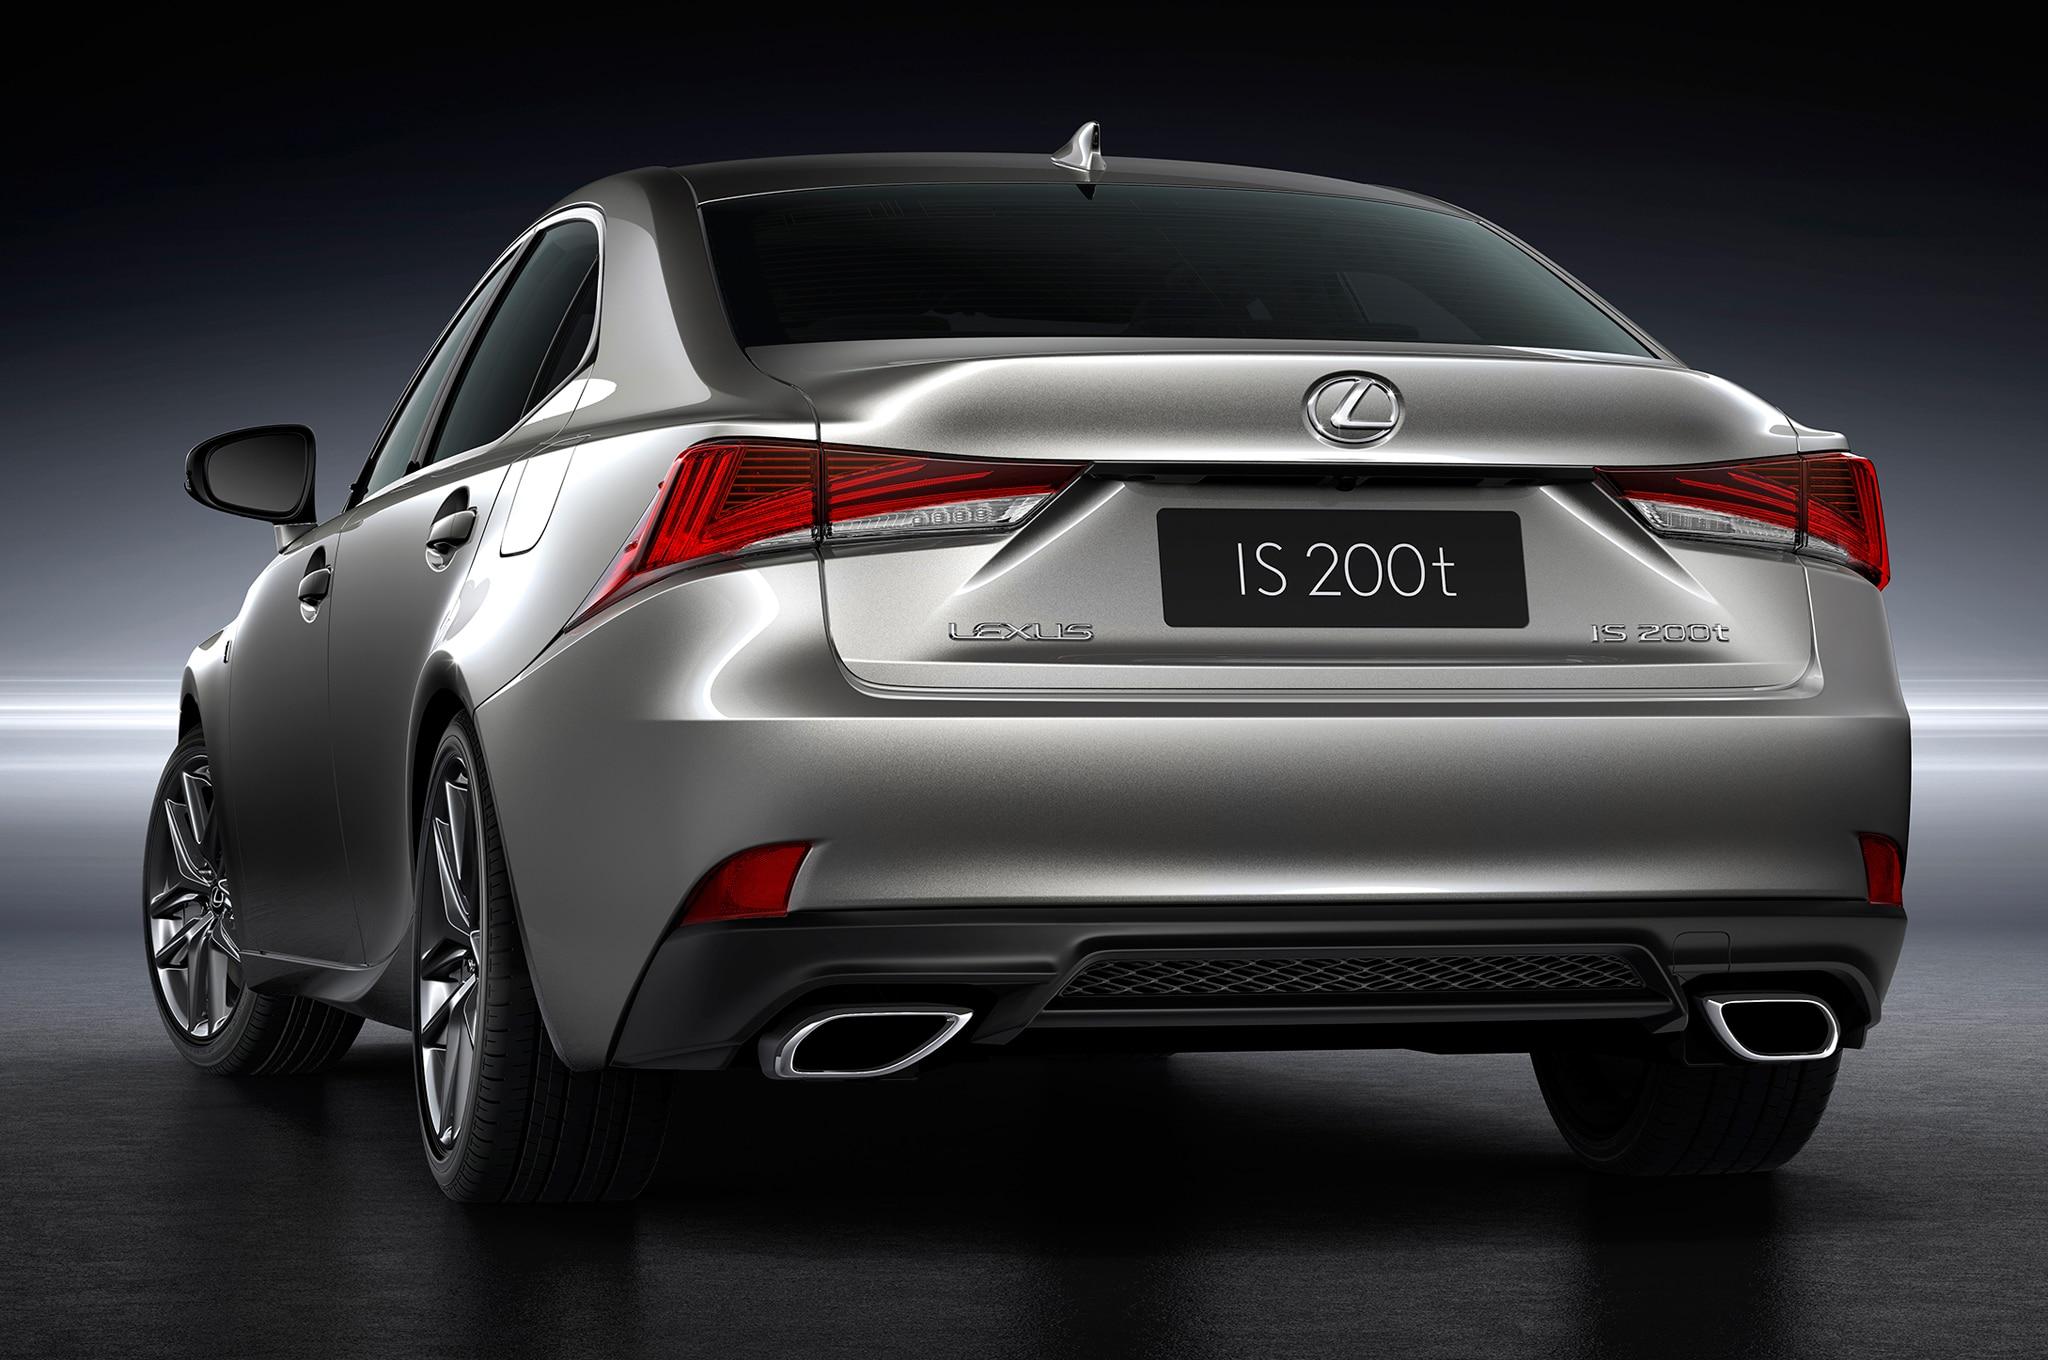 https://st.automobilemag.com/uploads/sites/11/2016/04/2017-Lexus-IS-Chinese-Spec-rear-end.jpg